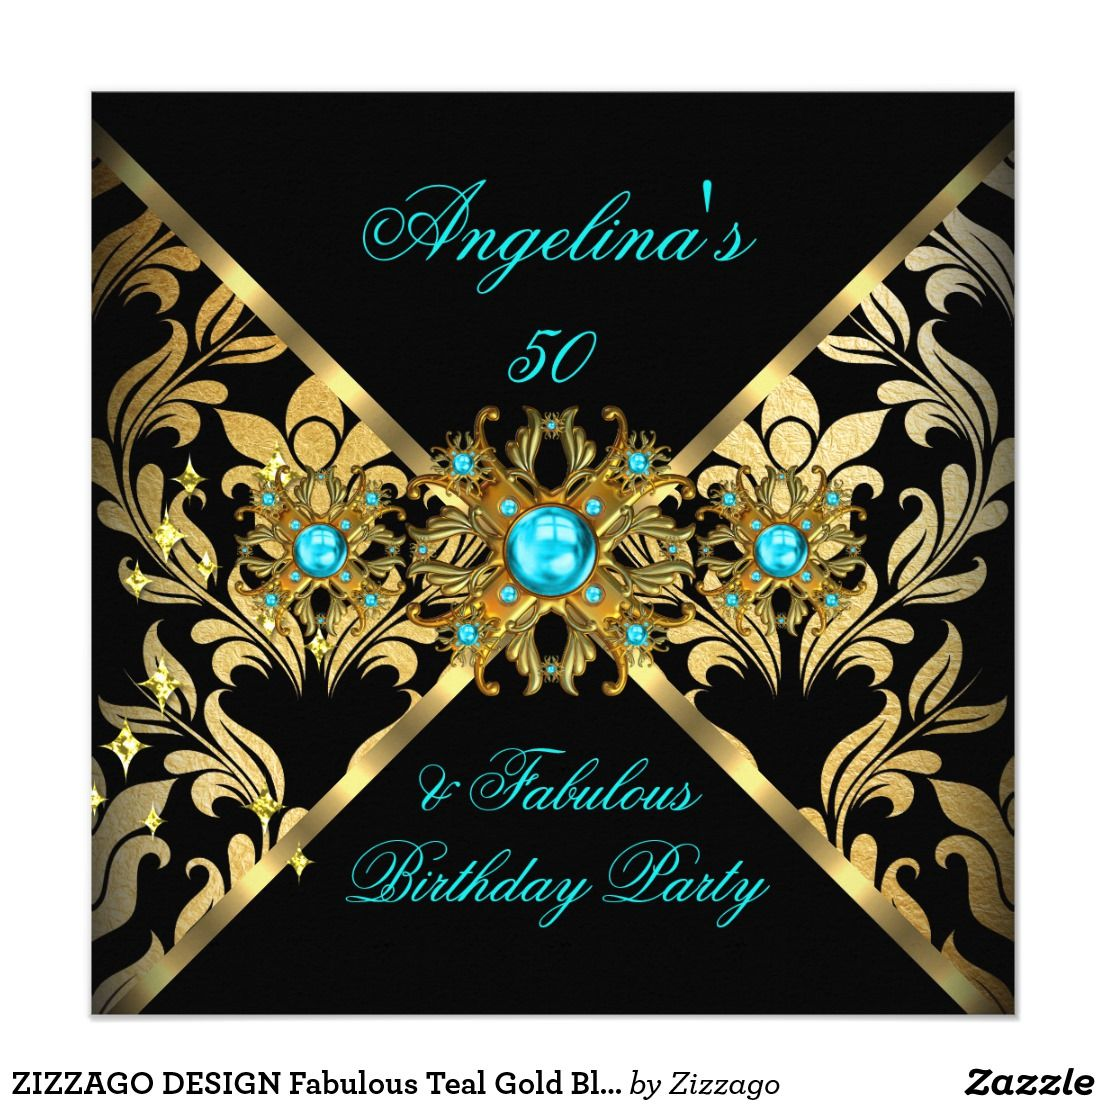 ZIZZAGO DESIGN Fabulous Teal Gold Black Damask Invitation | Zazzle.com |  Elegant birthday party, 50th birthday invitations, Blue birthday parties